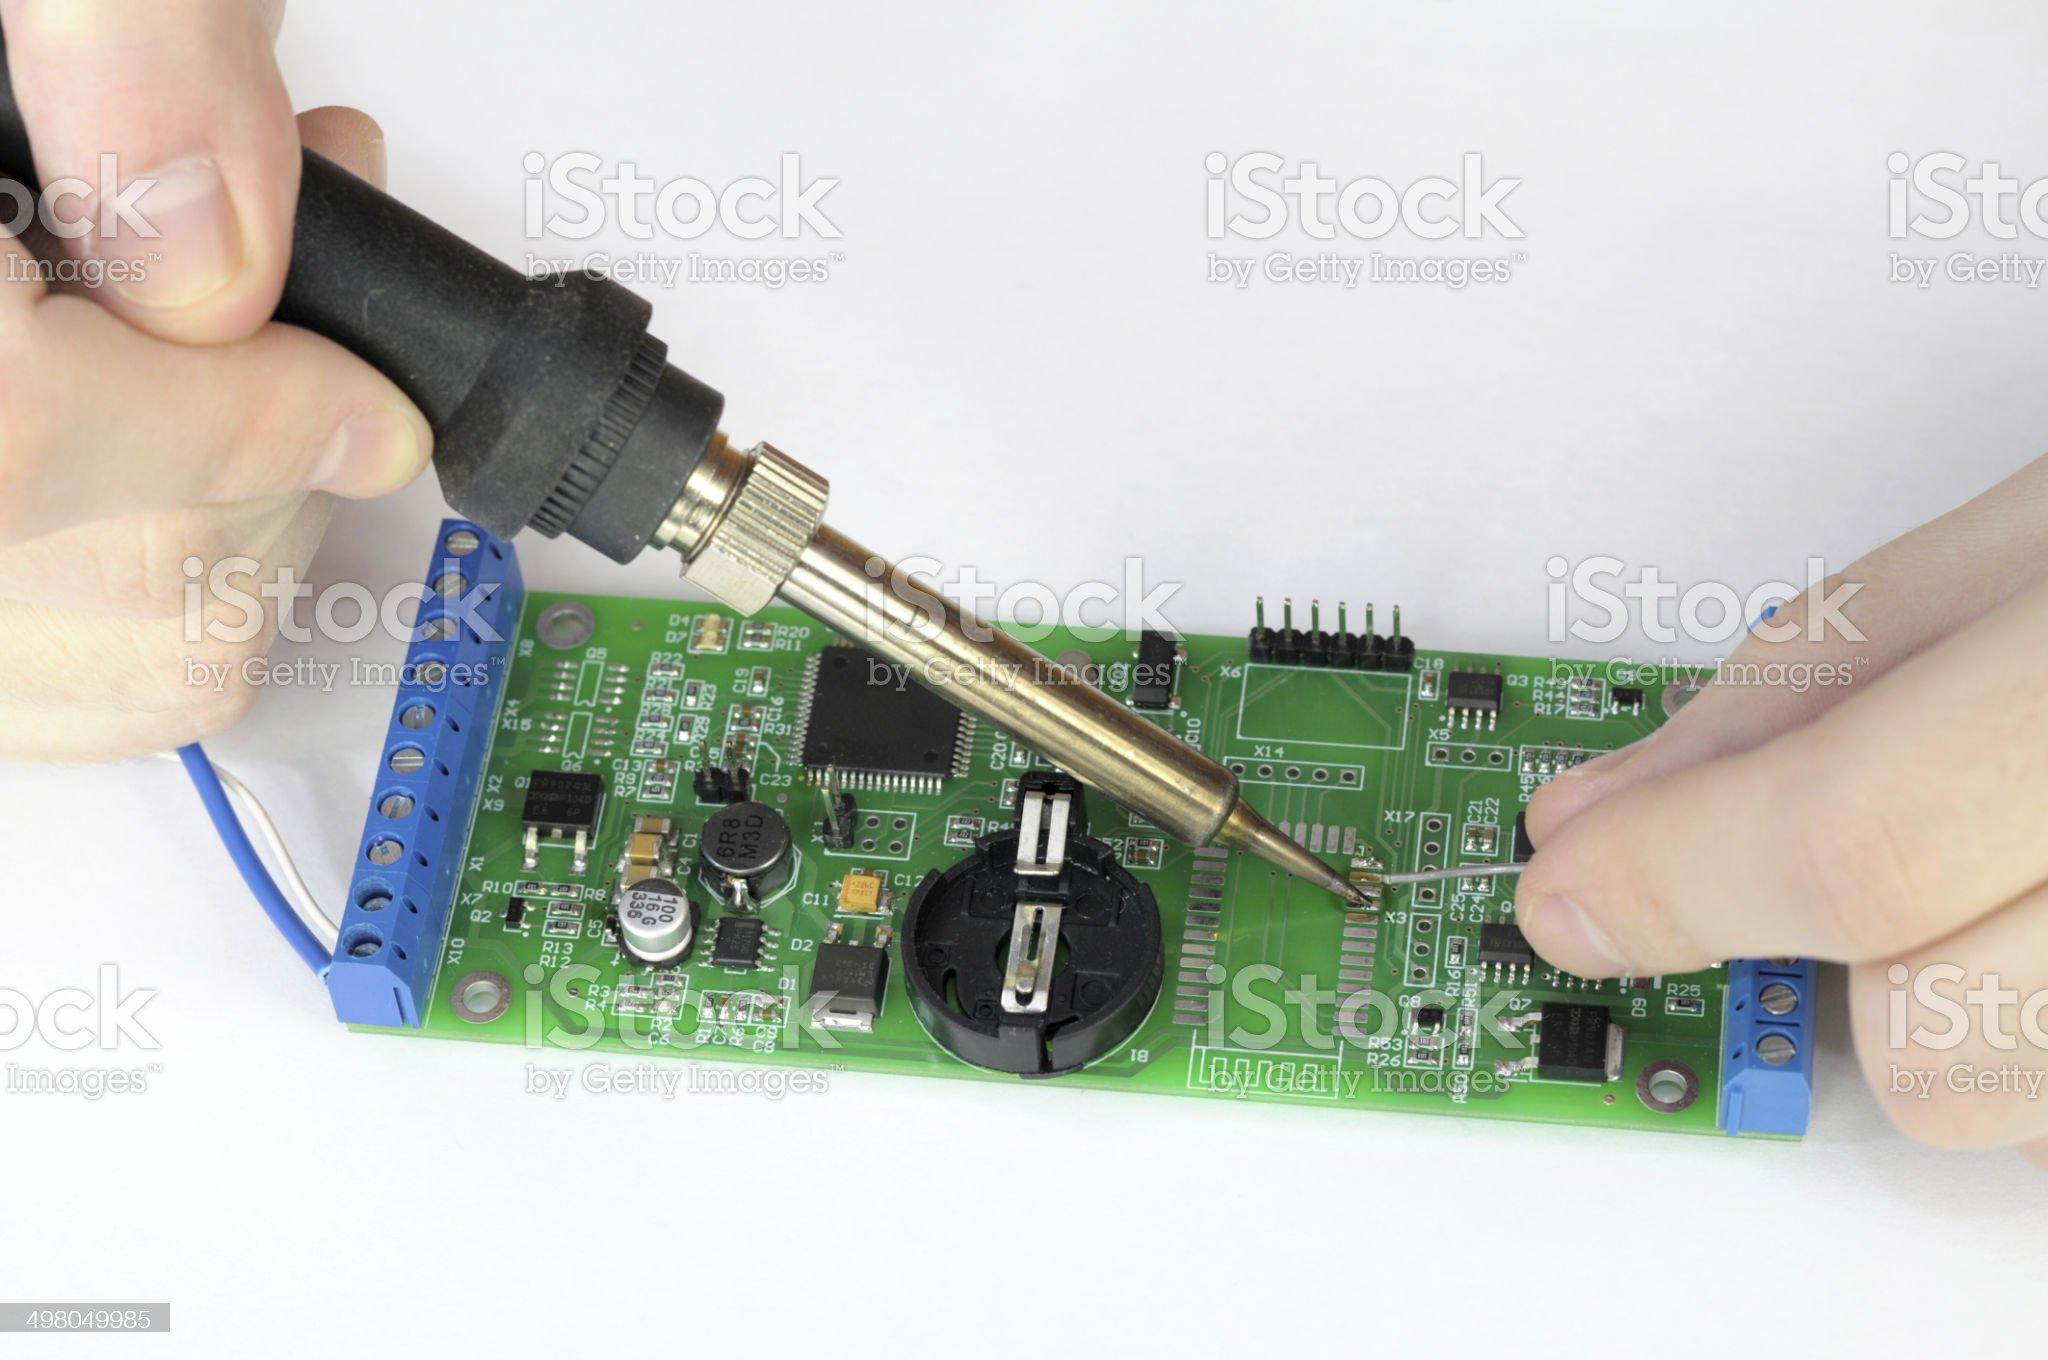 Repairing pc board royalty-free stock photo